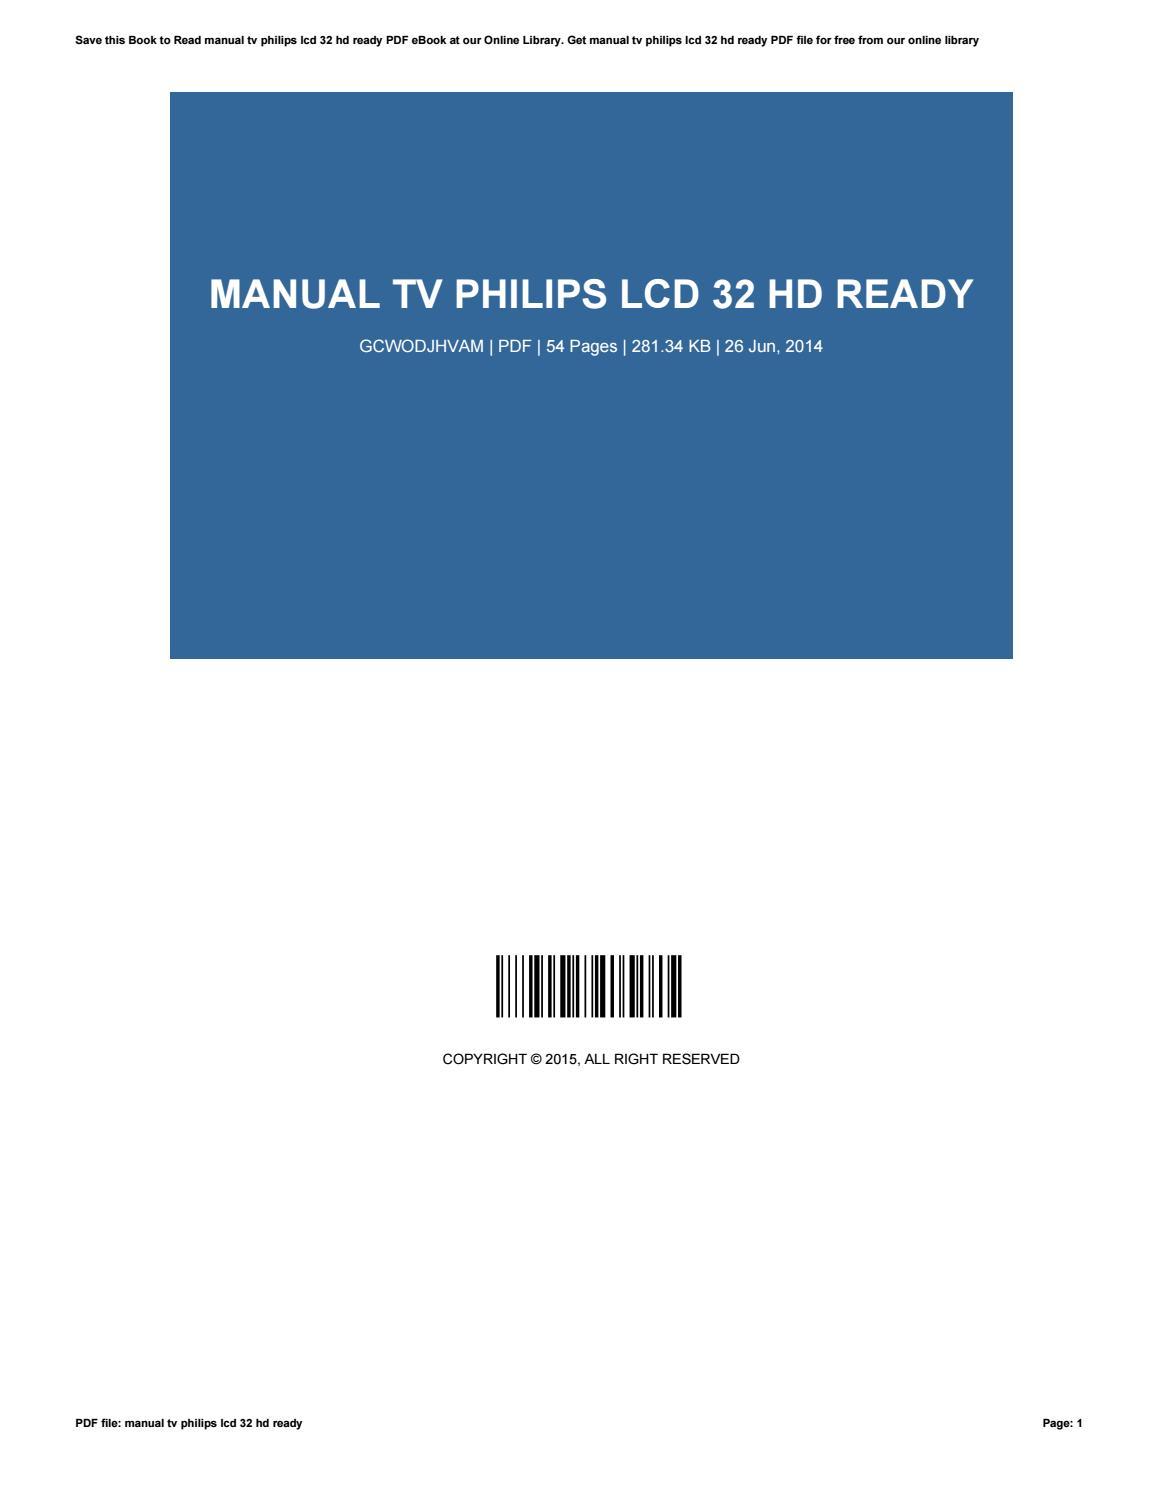 Manual tv philips lcd 32 hd ready by RamonaDailey2712 - issuu